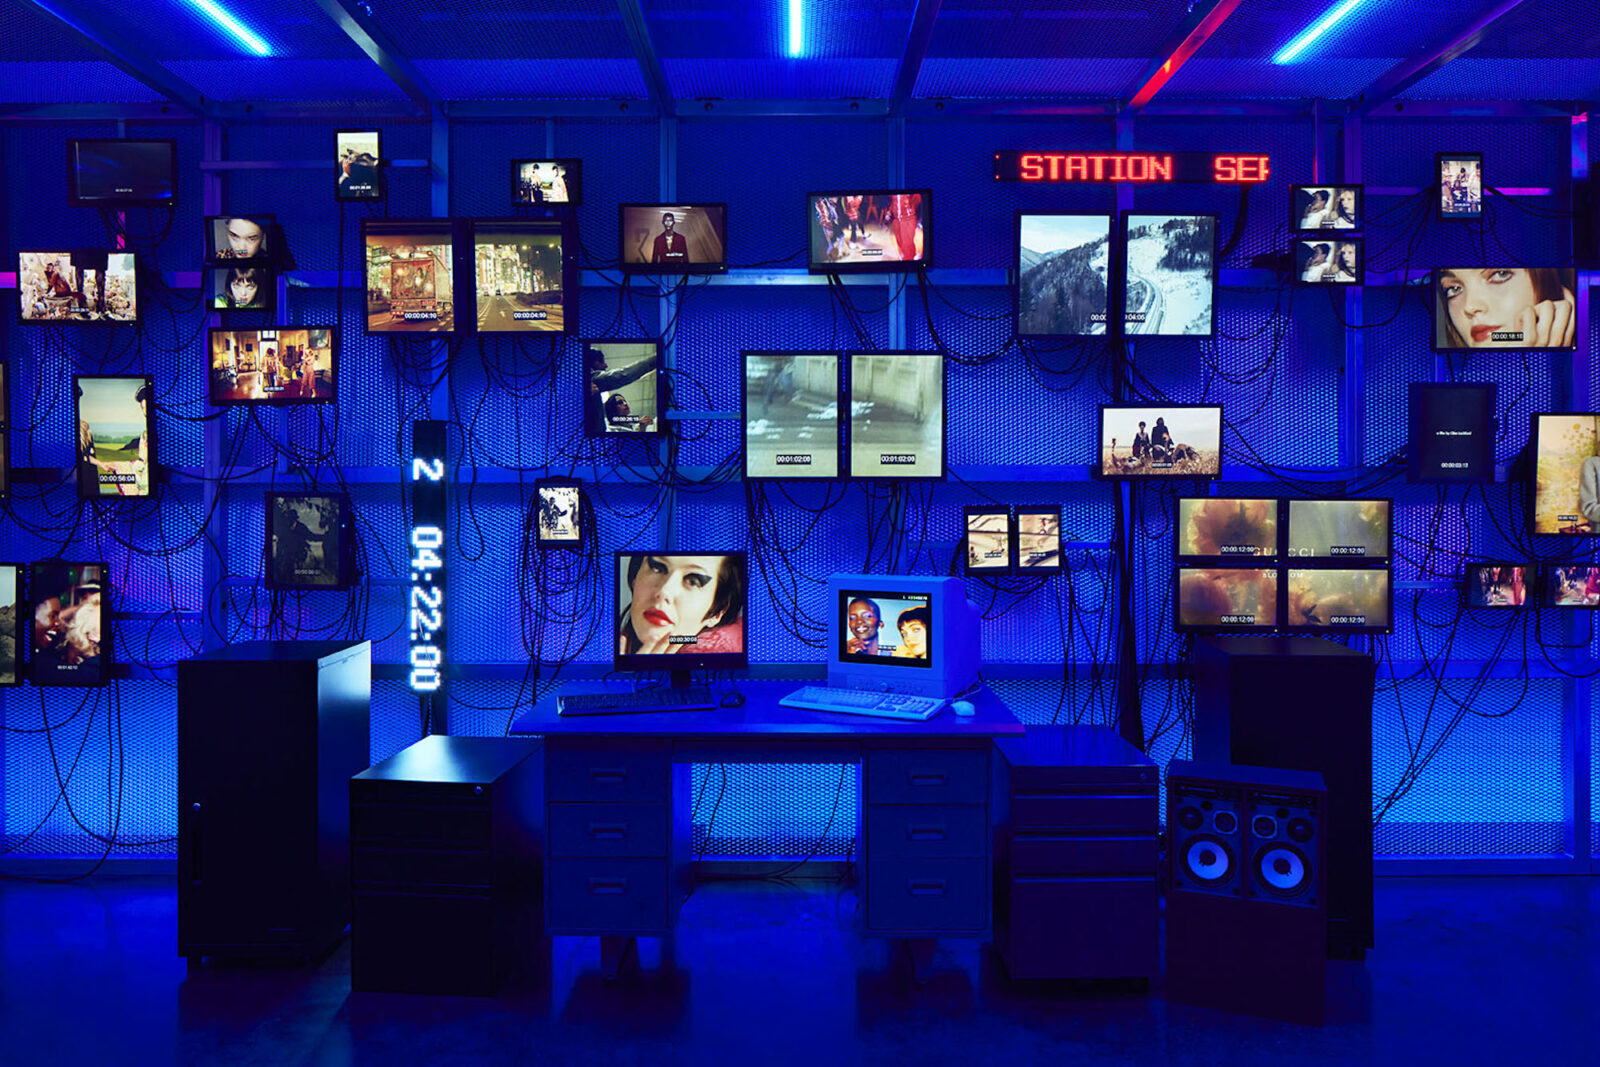 Room0「Control Room」